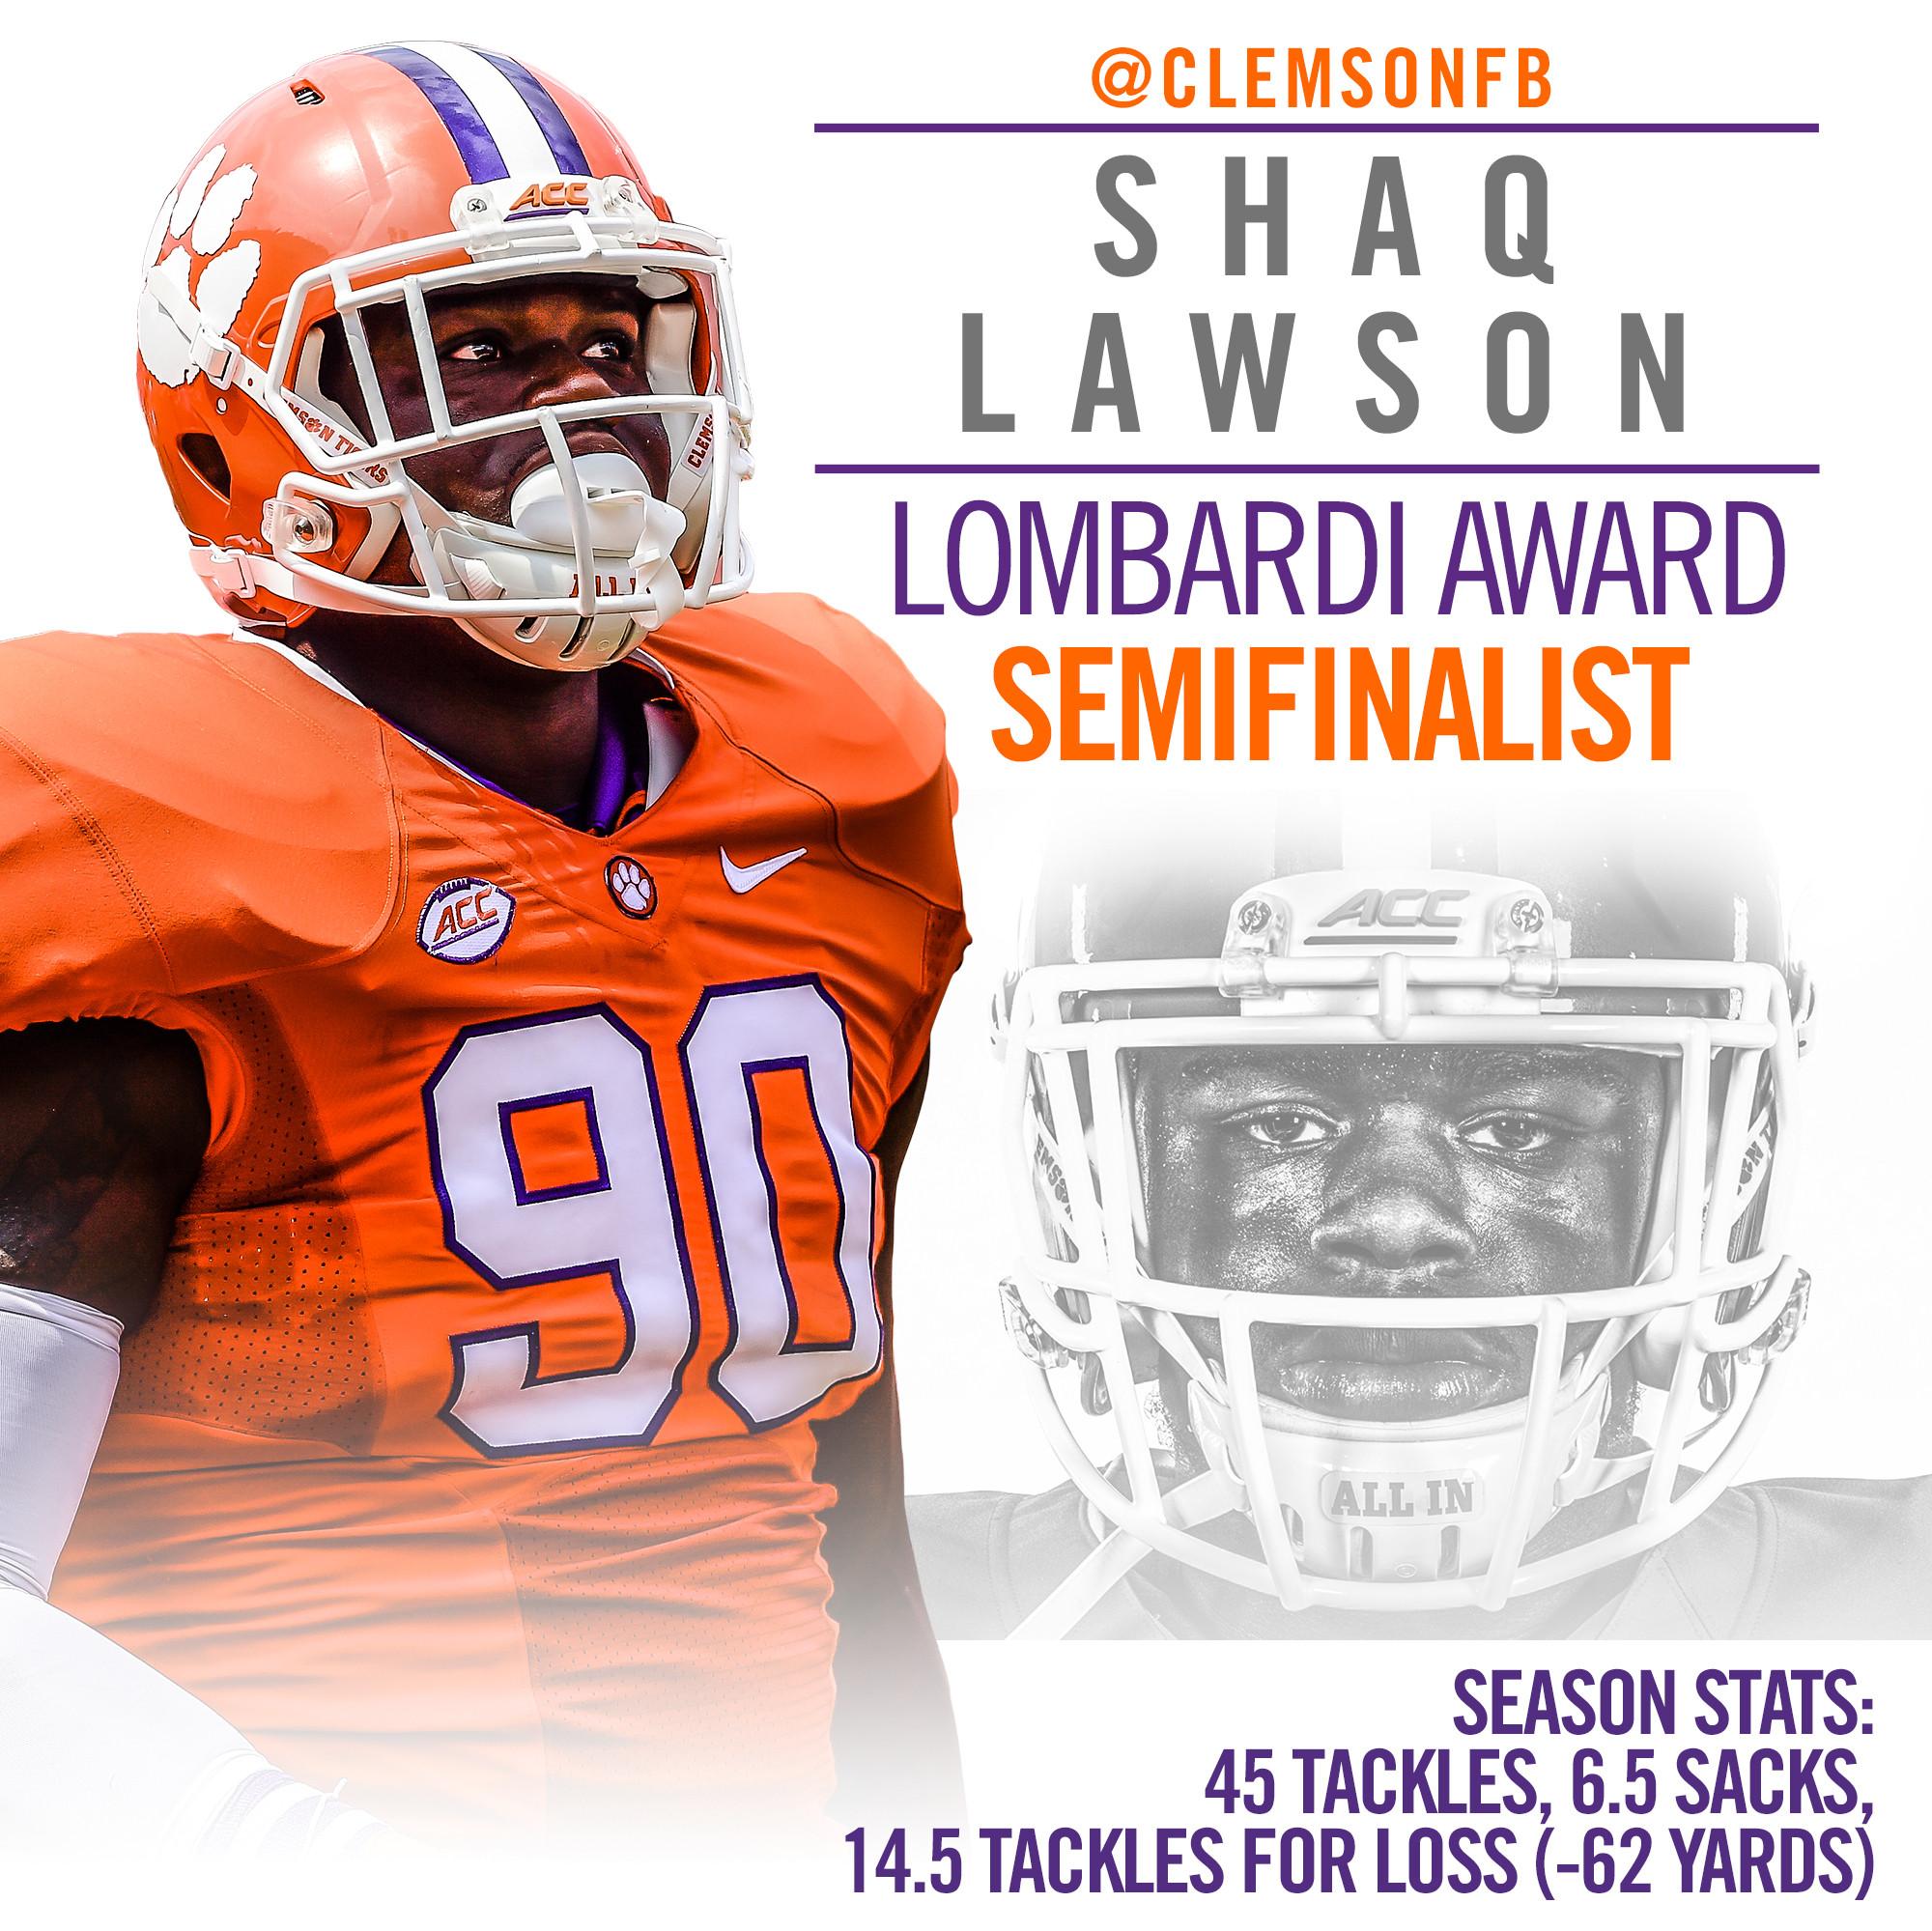 Lawson Named Semifinalist for Lombardi Award